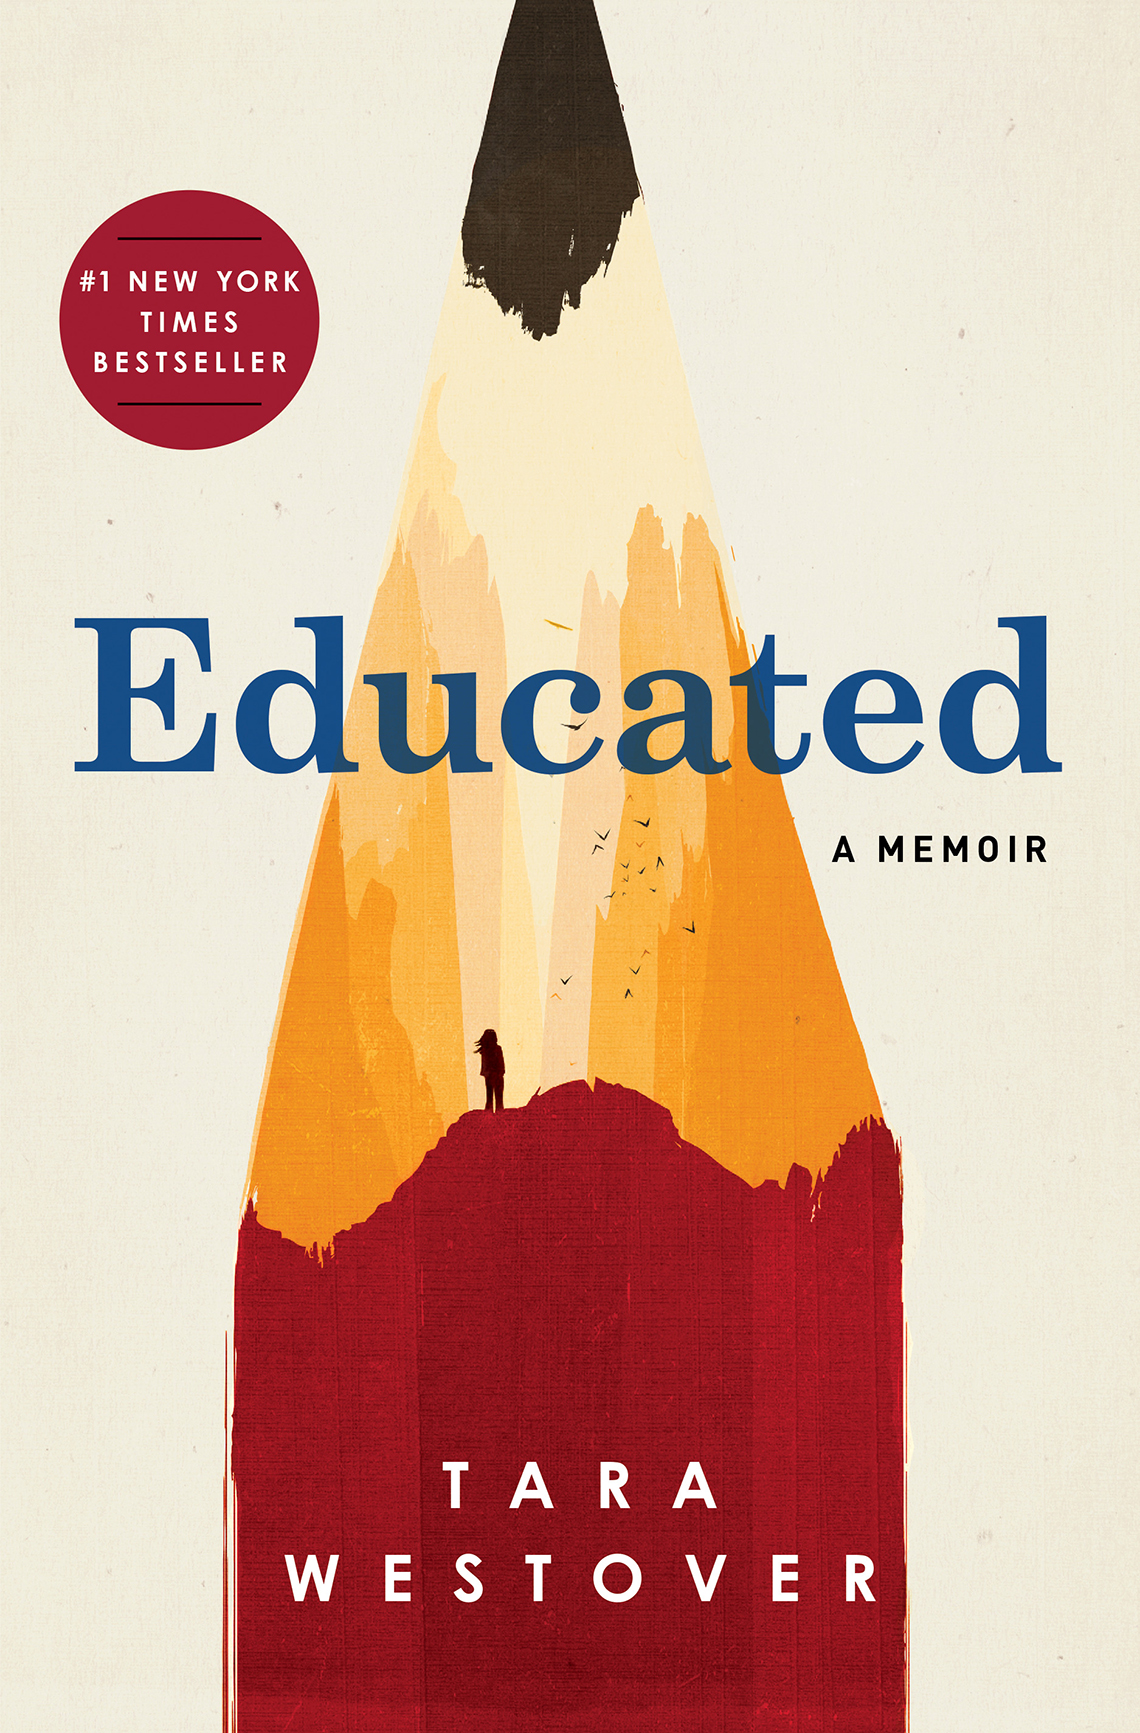 book cover, text reads: Educated, A Memoir, Tara Westover